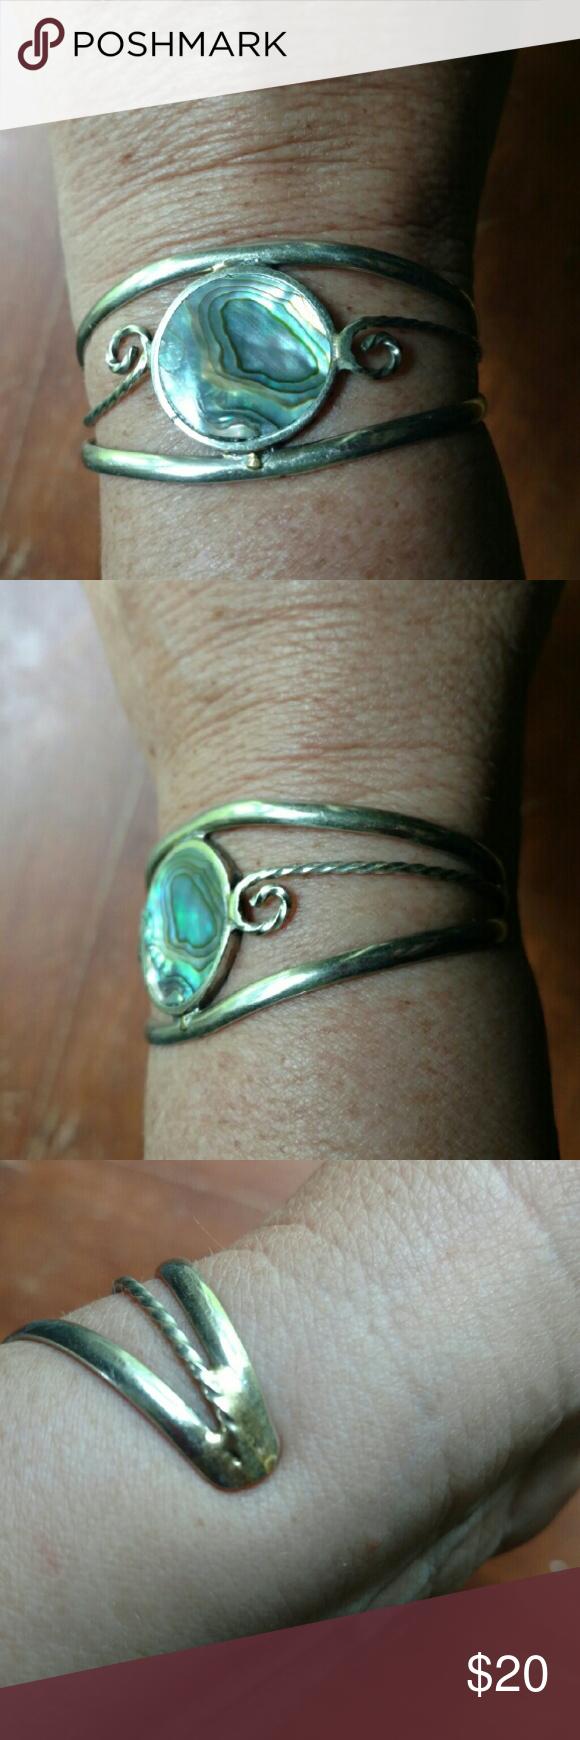 Round Abalone and Silver Bracelet Comfortably fits a size 7.25 size wrist, however, it can adjust a bit larger. Jewelry Bracelets